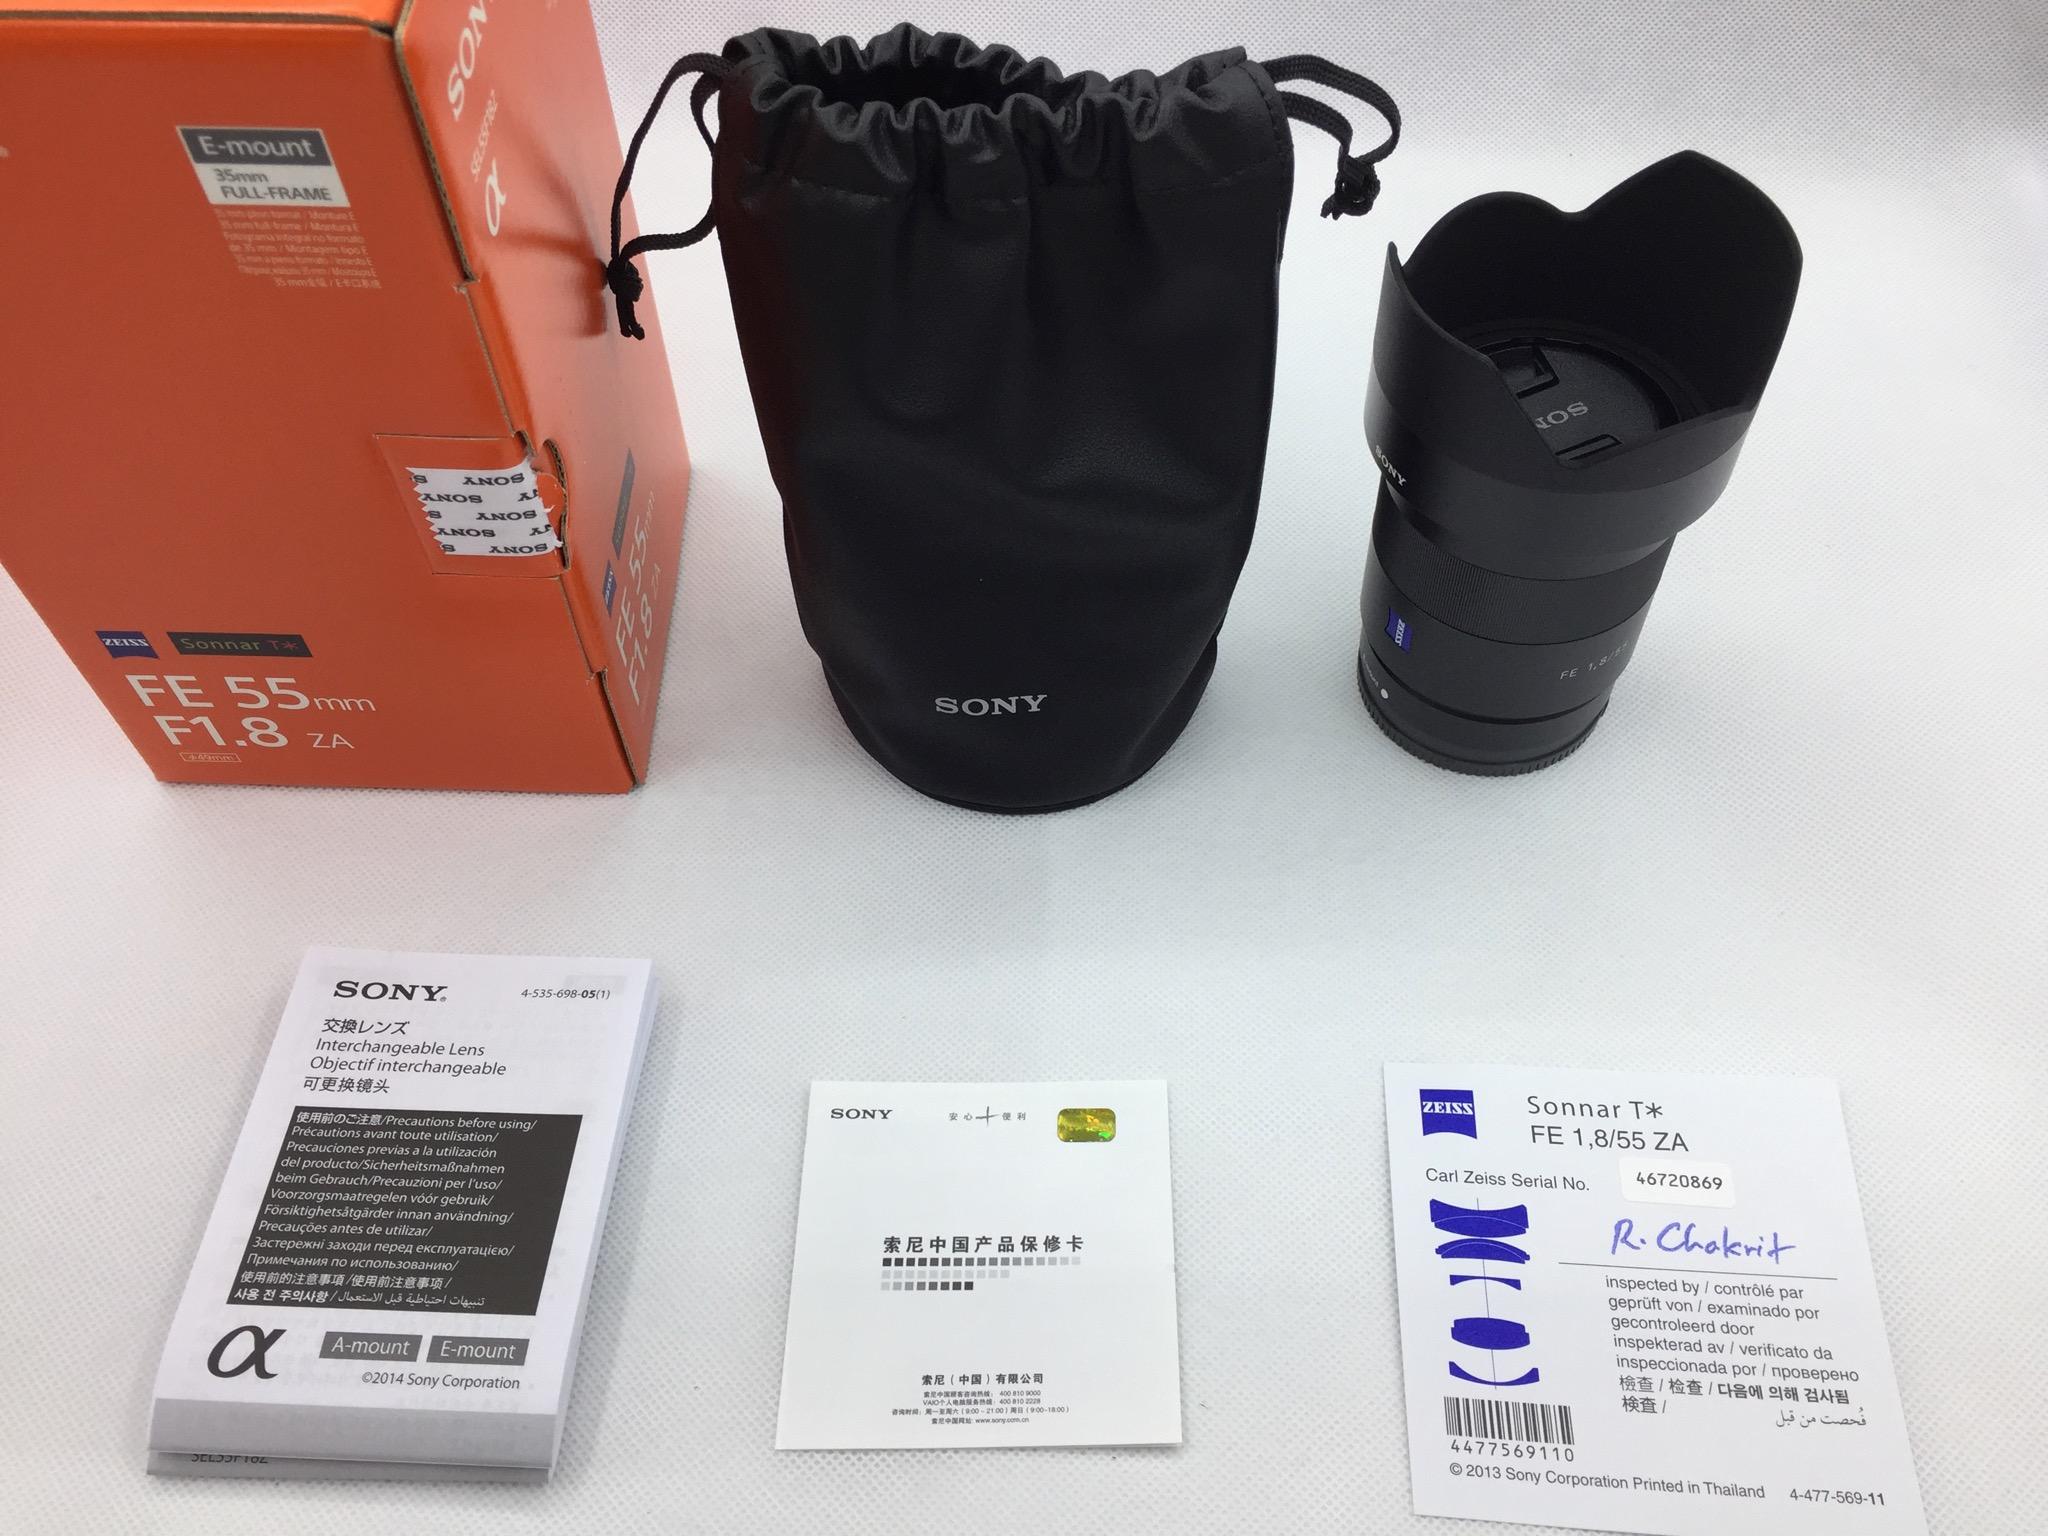 FE55 包装盒内一览